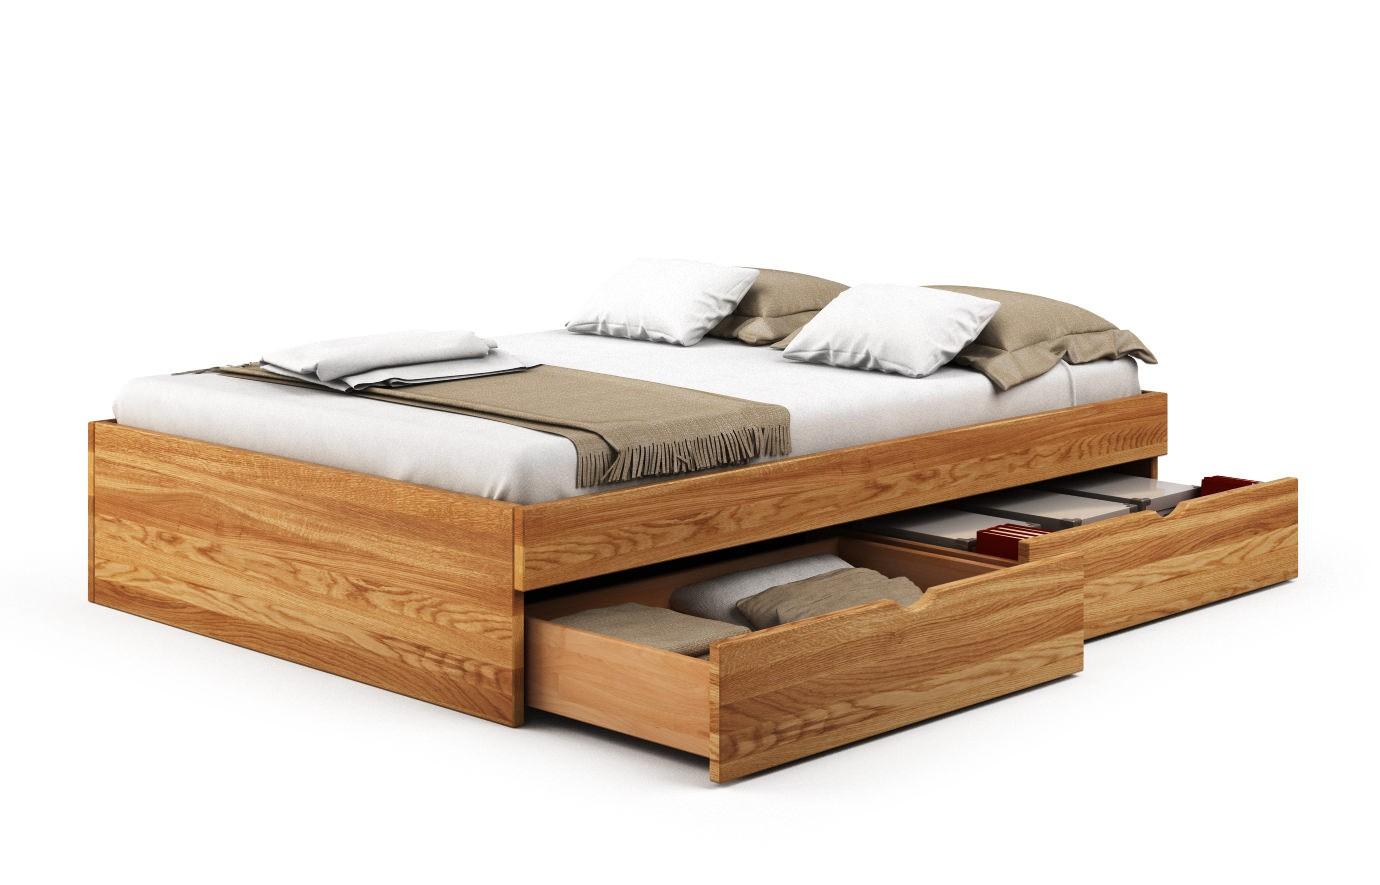 Full Size of Rustikales Bett Bettgestell Selber Bauen Rustikale Betten Gunstig Rustikal Aus Holz Kaufen 140x200 Massivholzbetten Holzbetten Mit Aufbewahrung Lifetime Bett Rustikales Bett